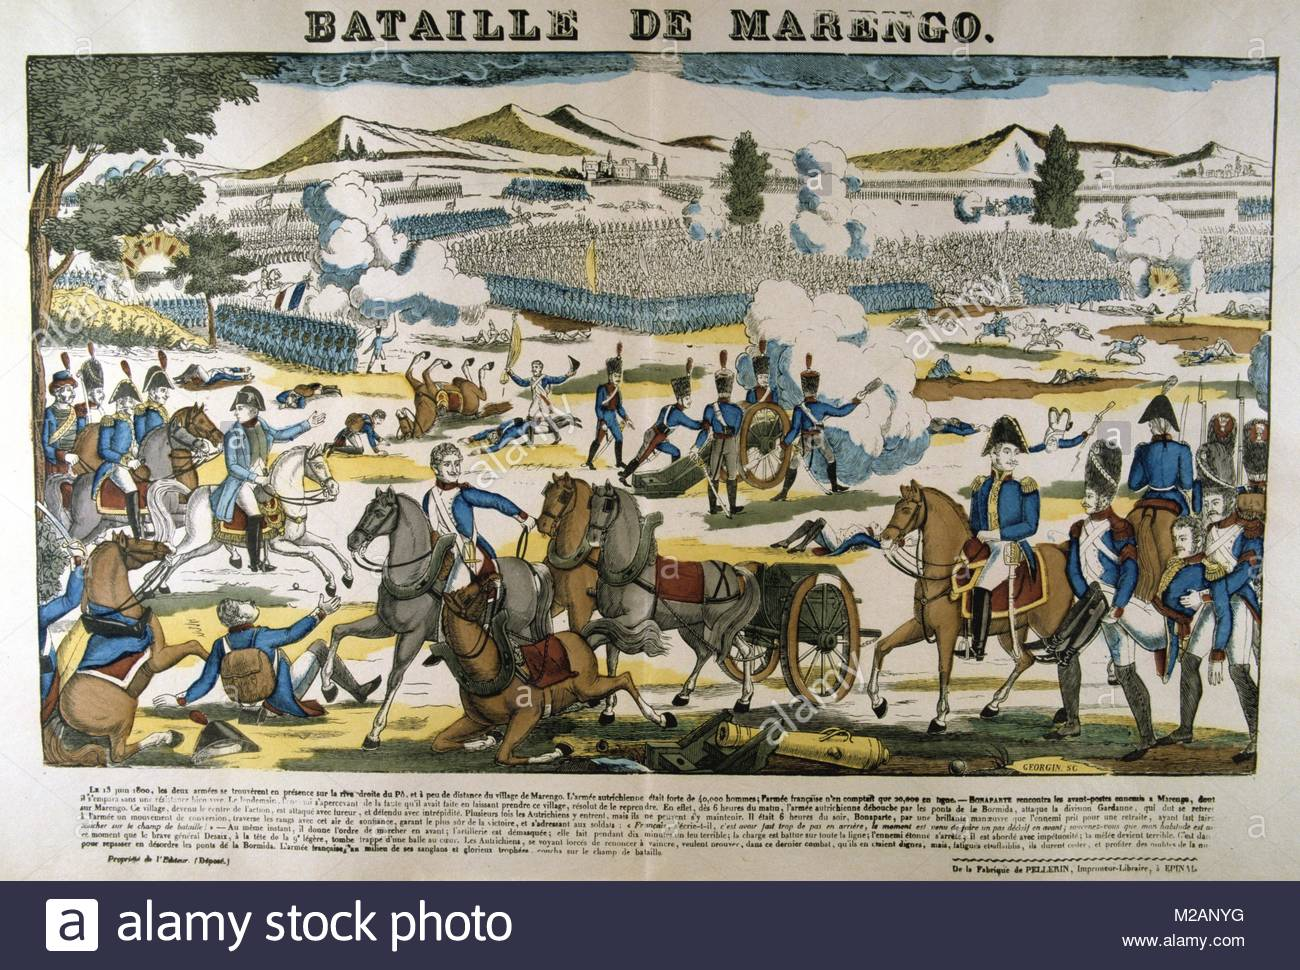 Bonparte, centre left, at the Battle of Marengo, 14 June 1800 - Stock Image